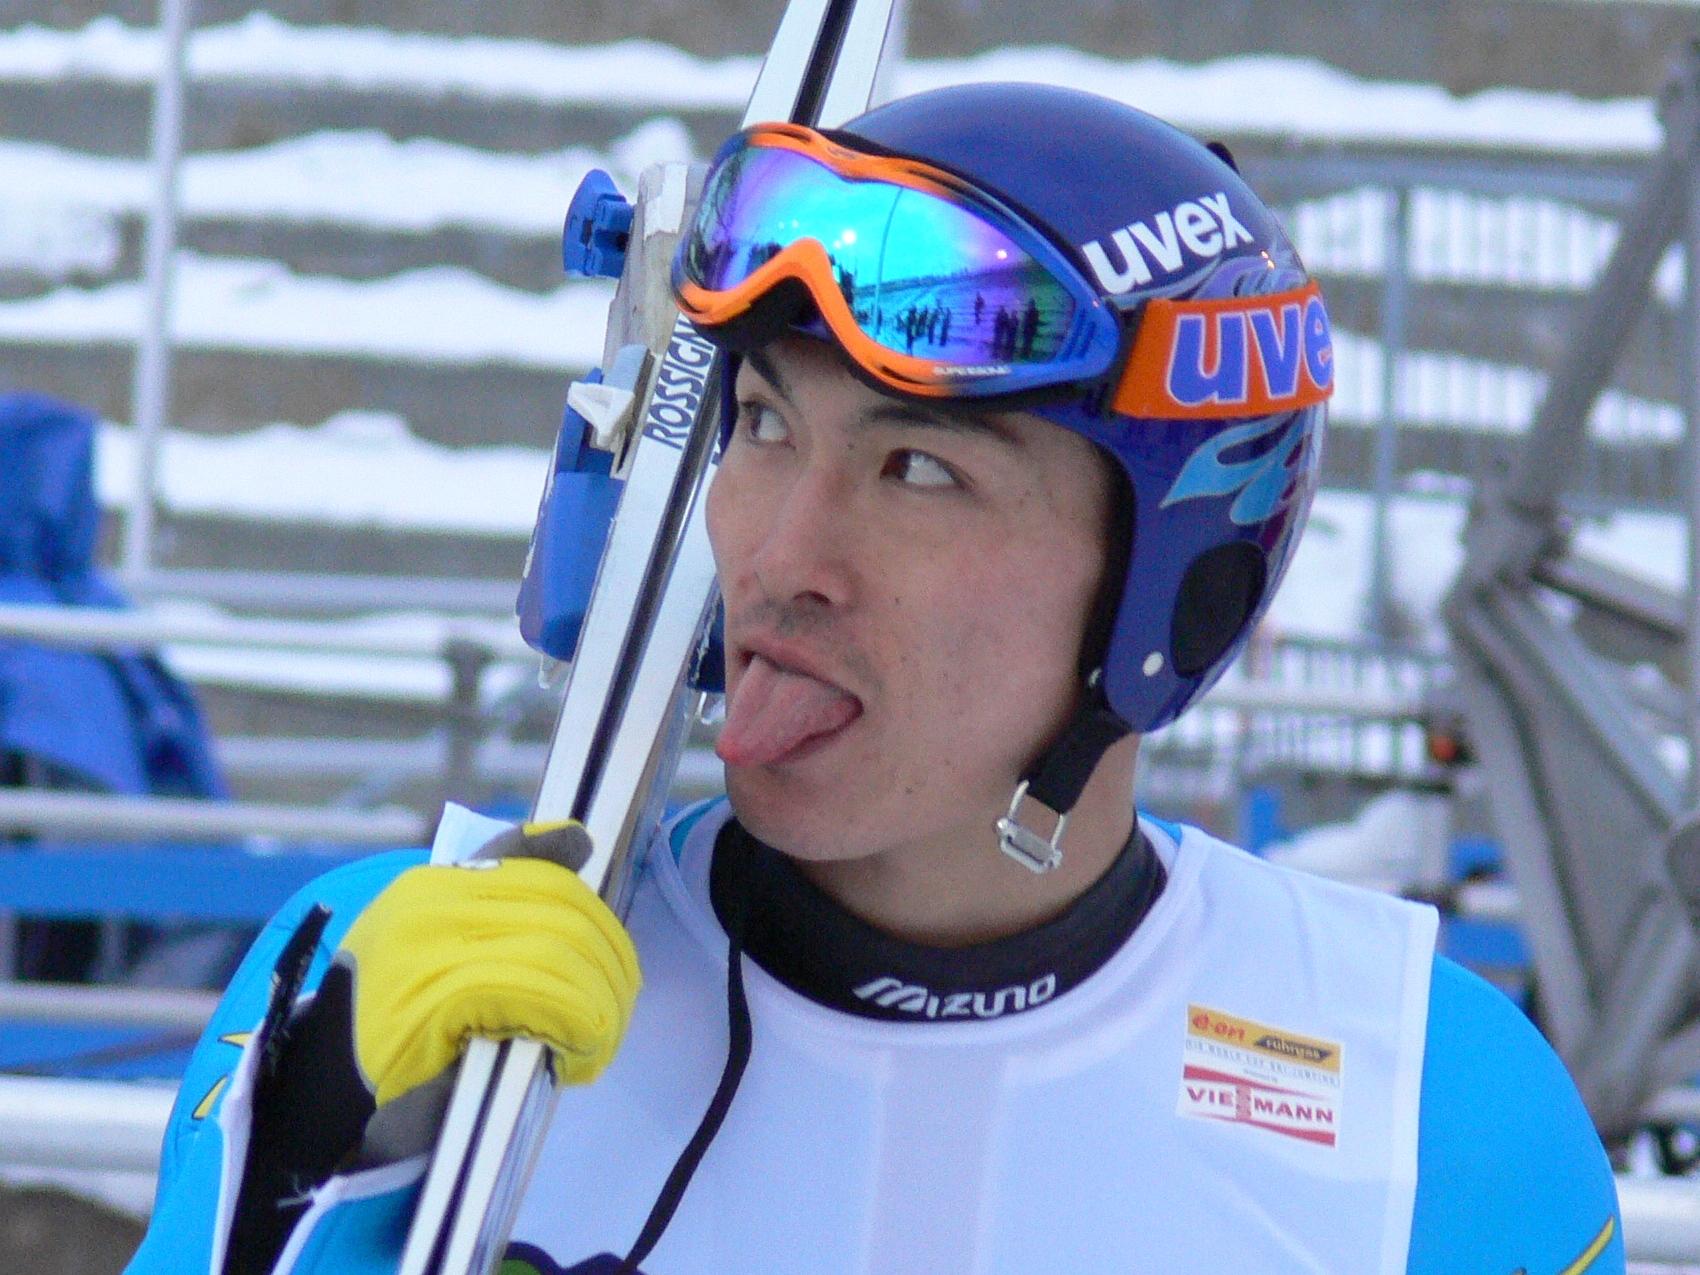 東輝 - Wikipedia